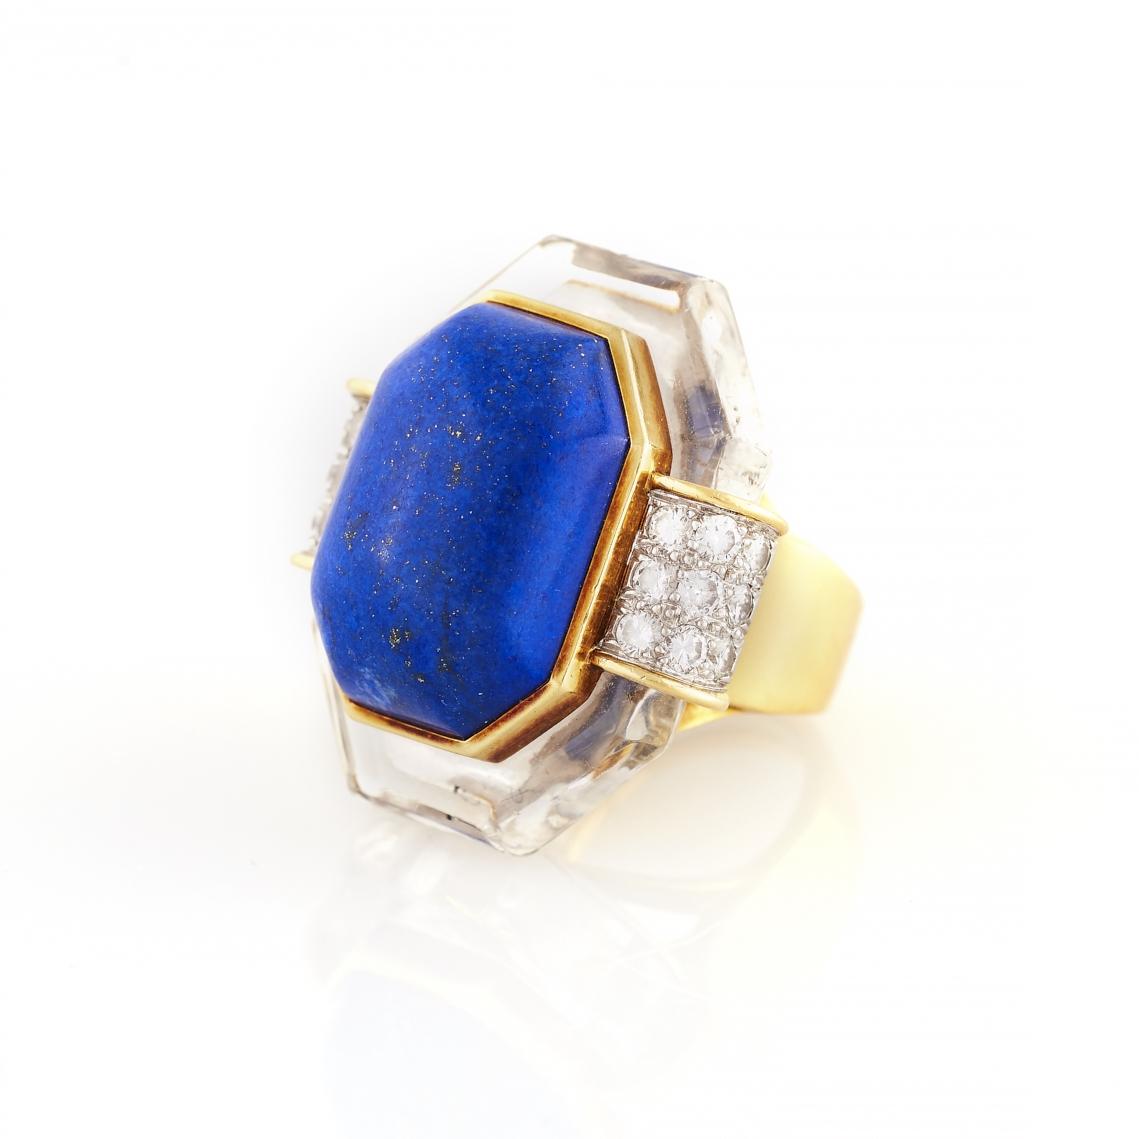 David Webb Lapis, Rock Crystal, and Diamond Gold Ring